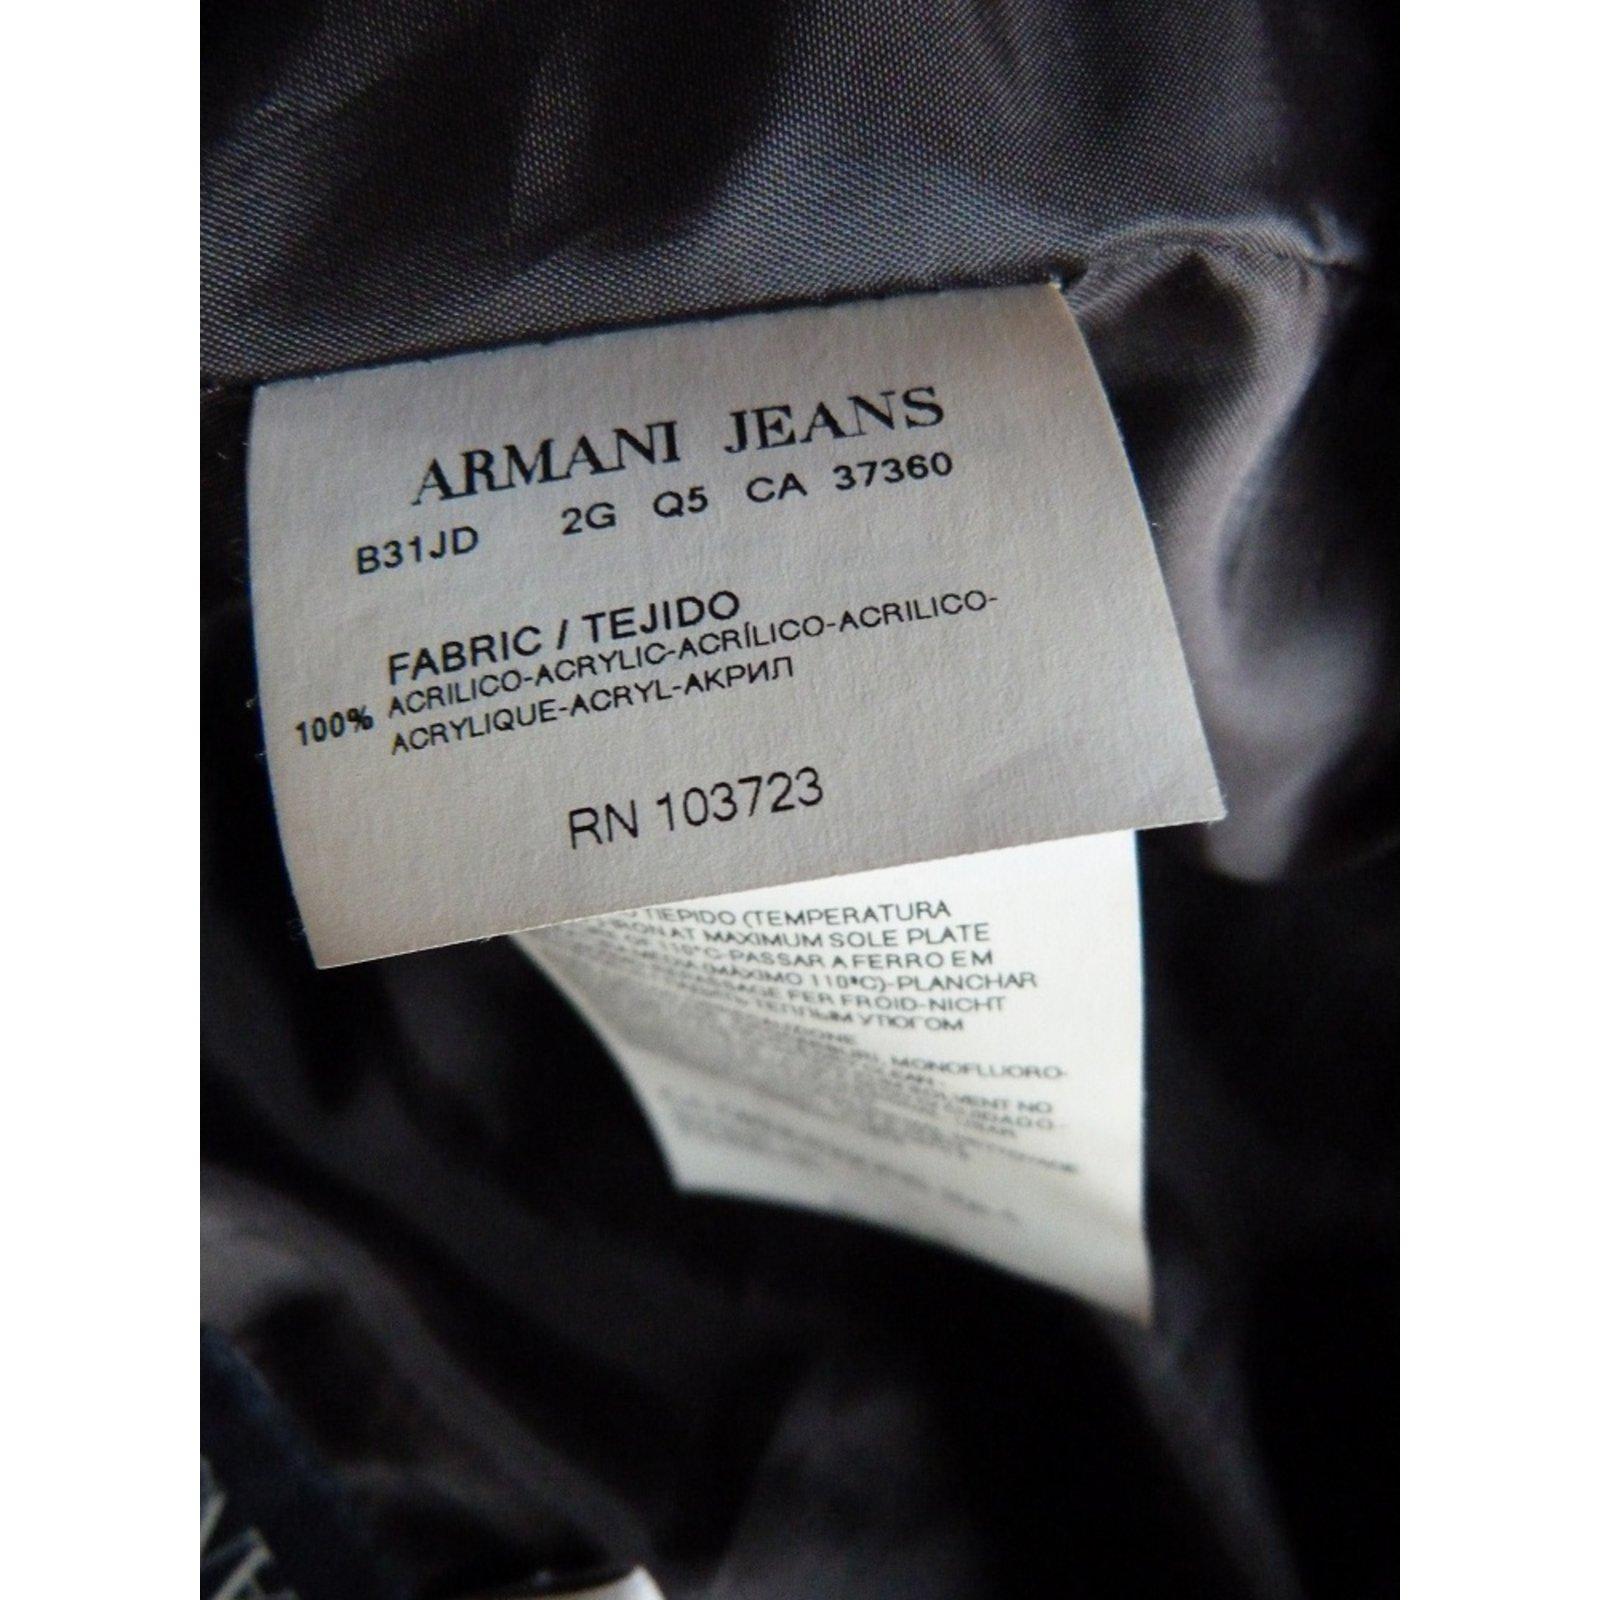 Jeans Veste 103723 Femme Armani Rn WDH2E9I